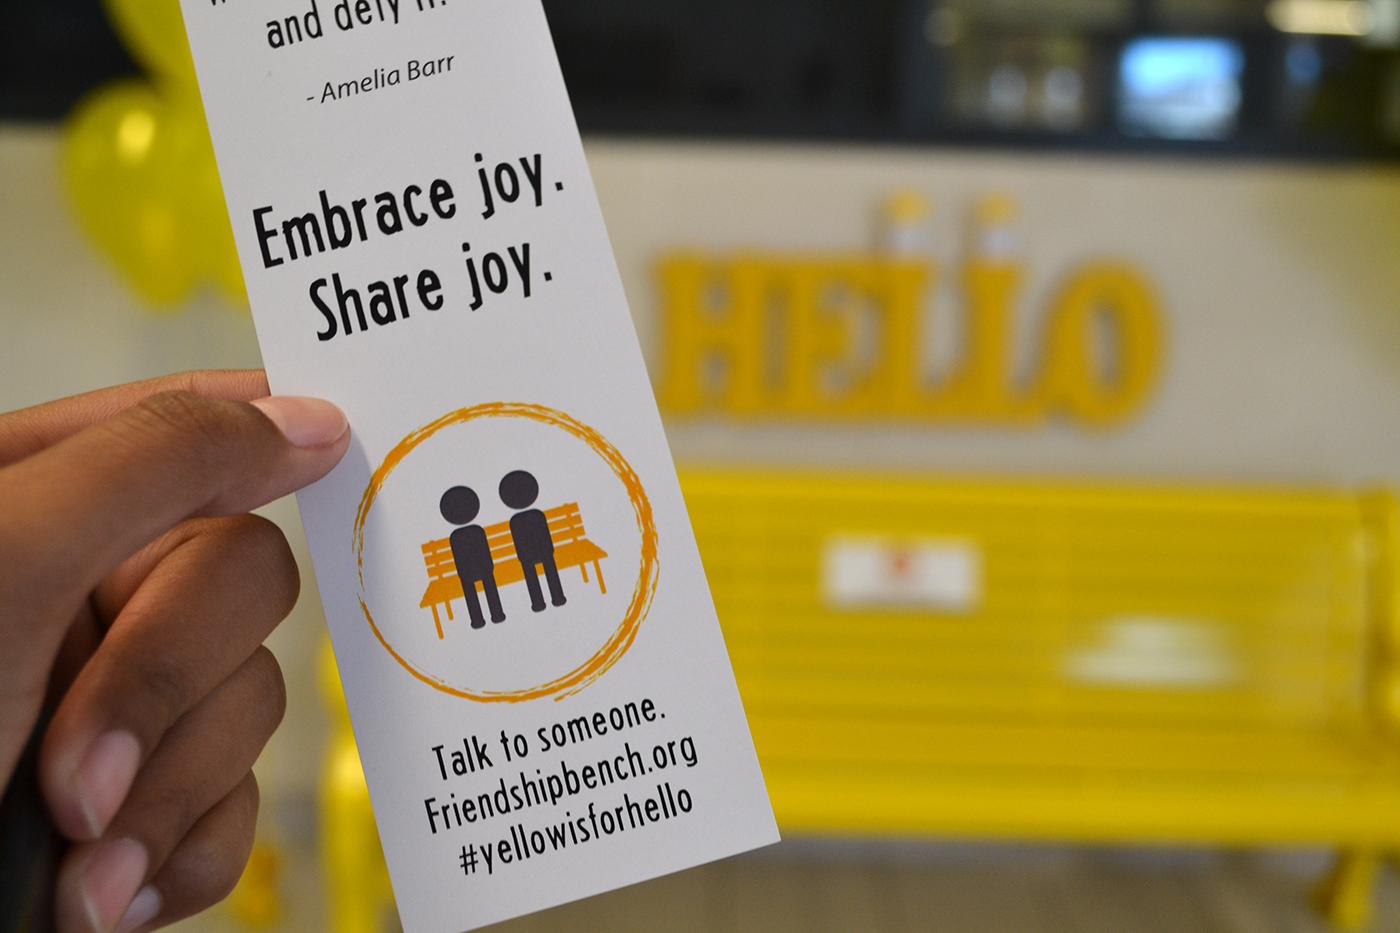 The Friendship Bench   #YellowIsForHello